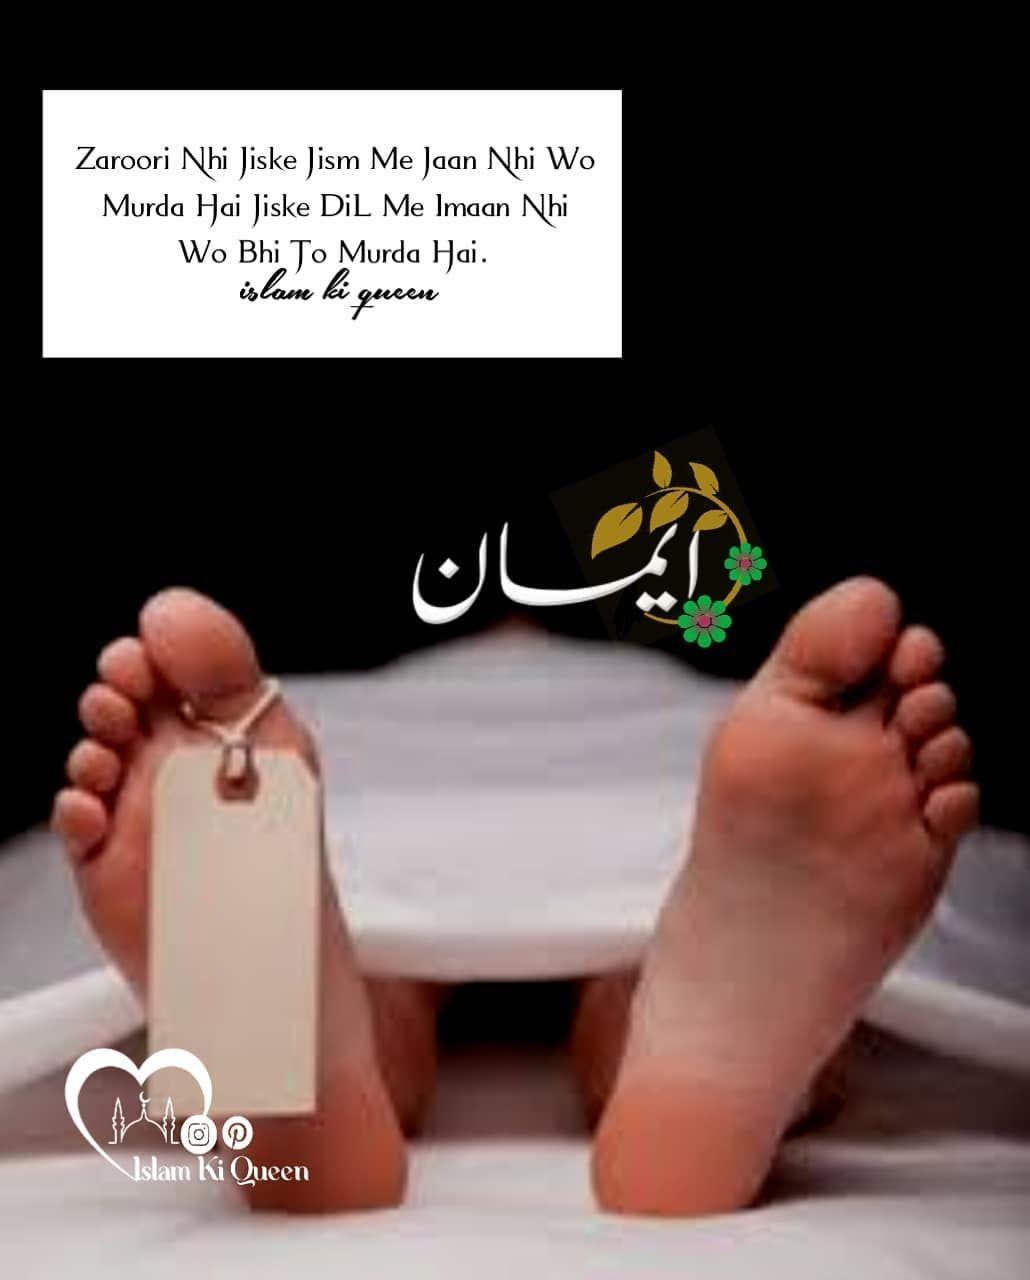 Islam Ki Queen Posted On Their Instagram Profile Beshaq Follo Ramadan Quotes Islamic Love Quotes Funny Quotes In Urdu